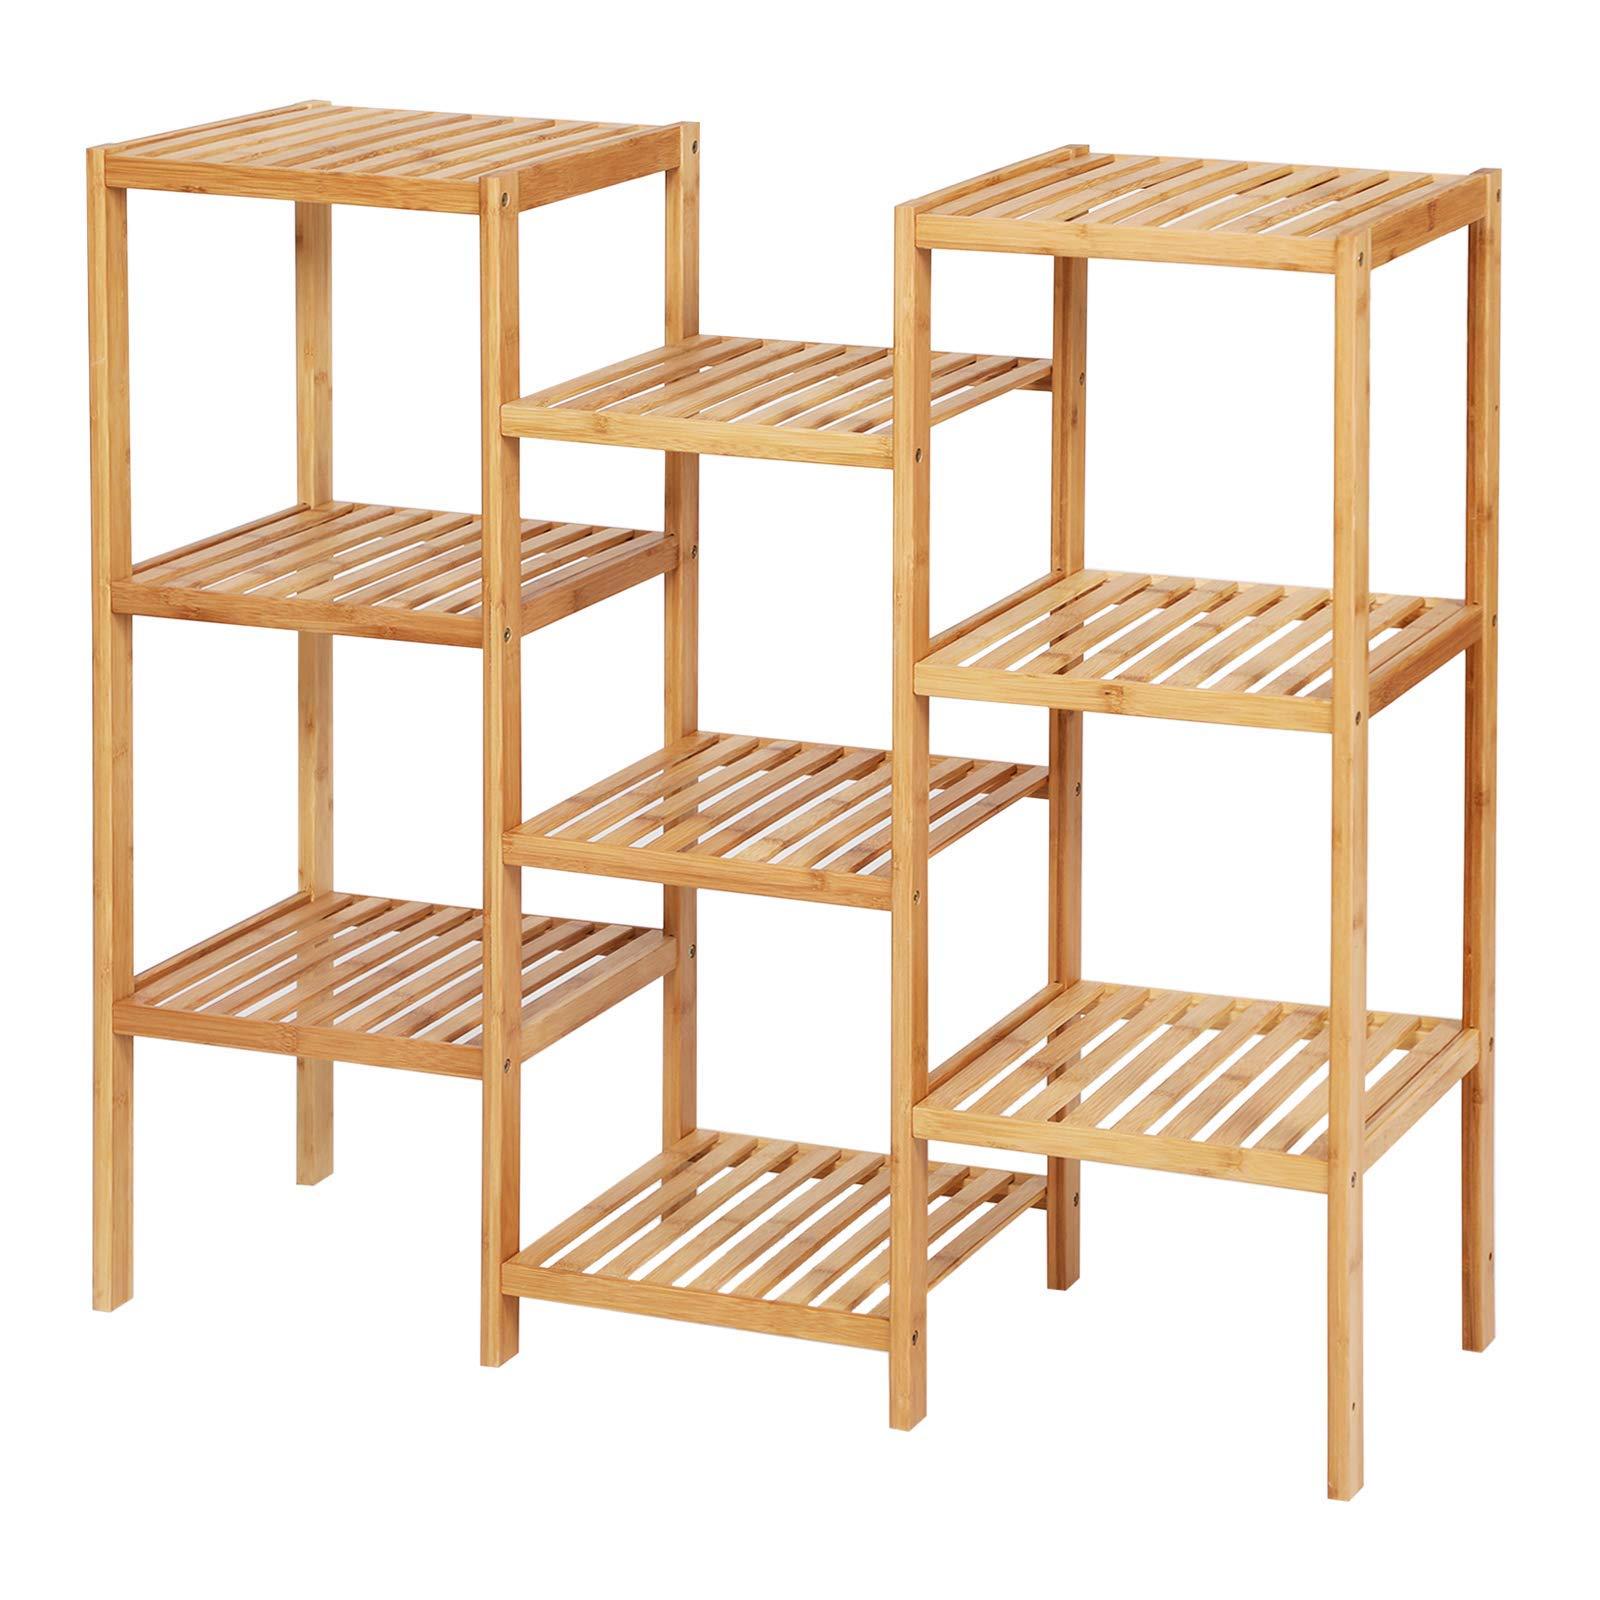 SONGMICS Bamboo Customizable Plant Stand Shelf Flower Pots Holder Display Rack Utility Shelf Bathroom Rack 9-Tier Storage Rack Shelving Unit UBCB93Y (Renewed) by SONGMICS